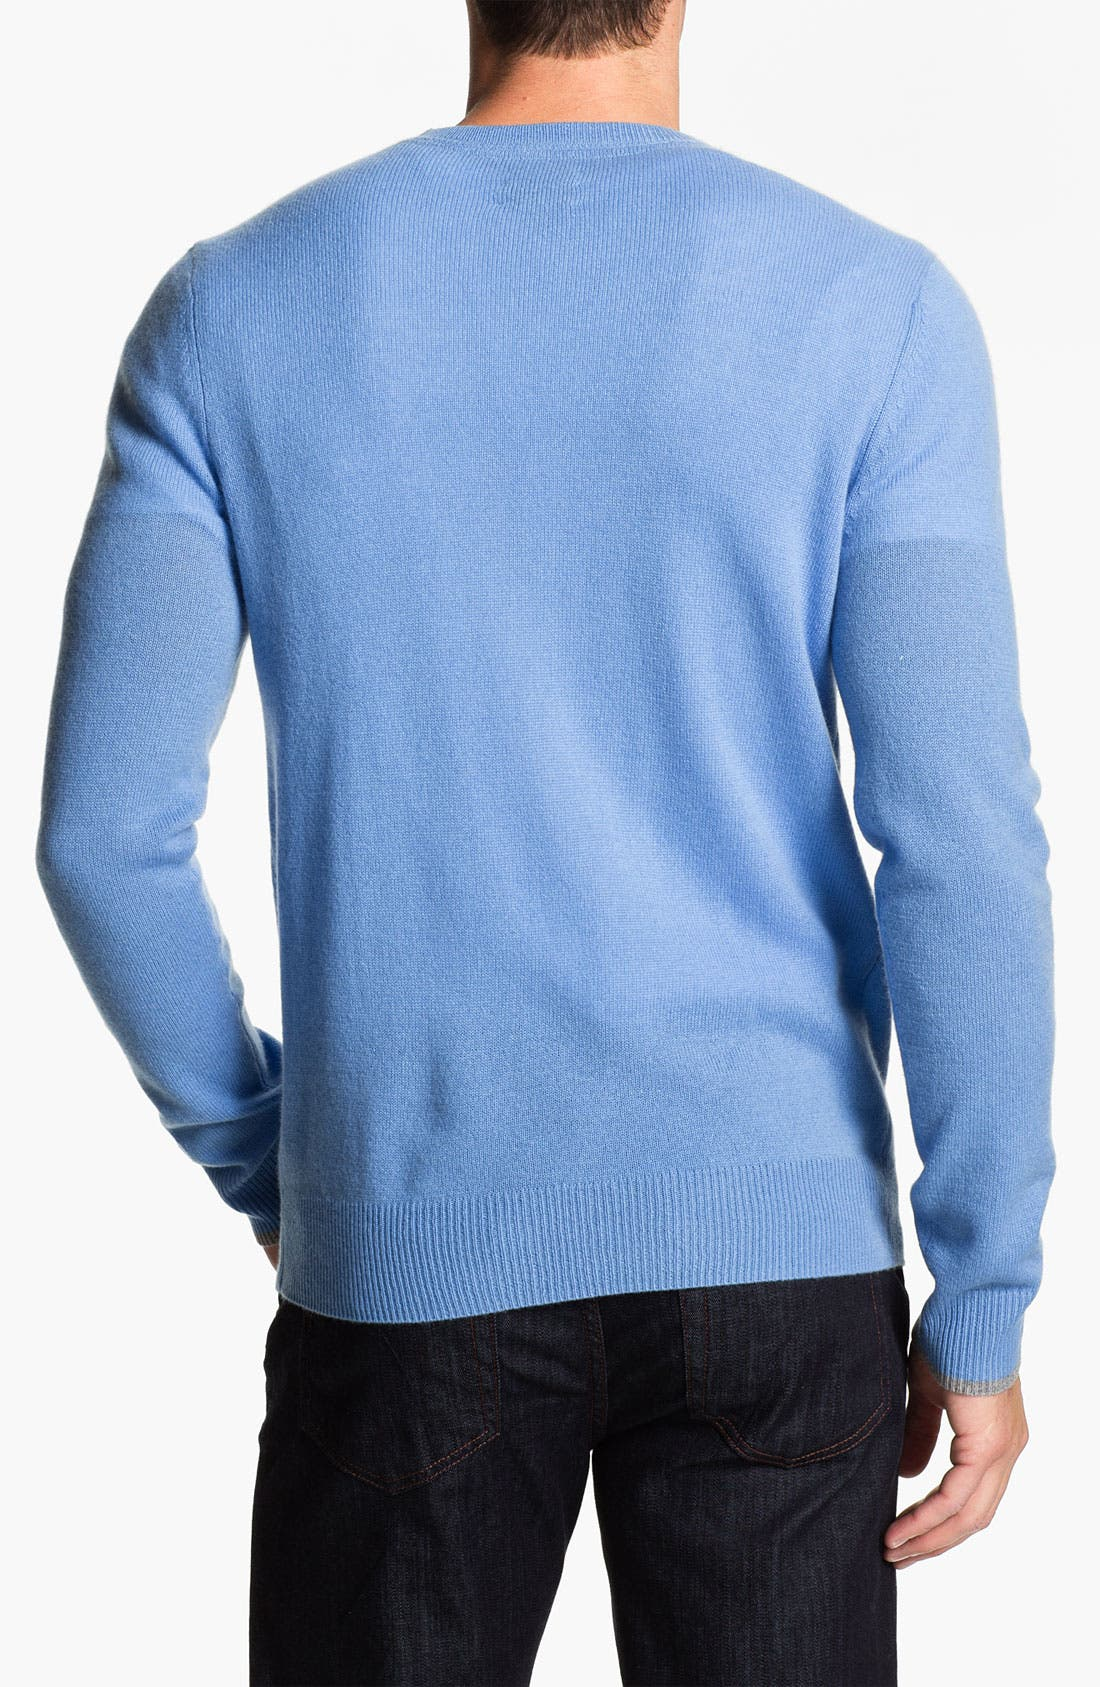 Alternate Image 2  - 1901 Trim Fit V-Neck Cashmere Sweater